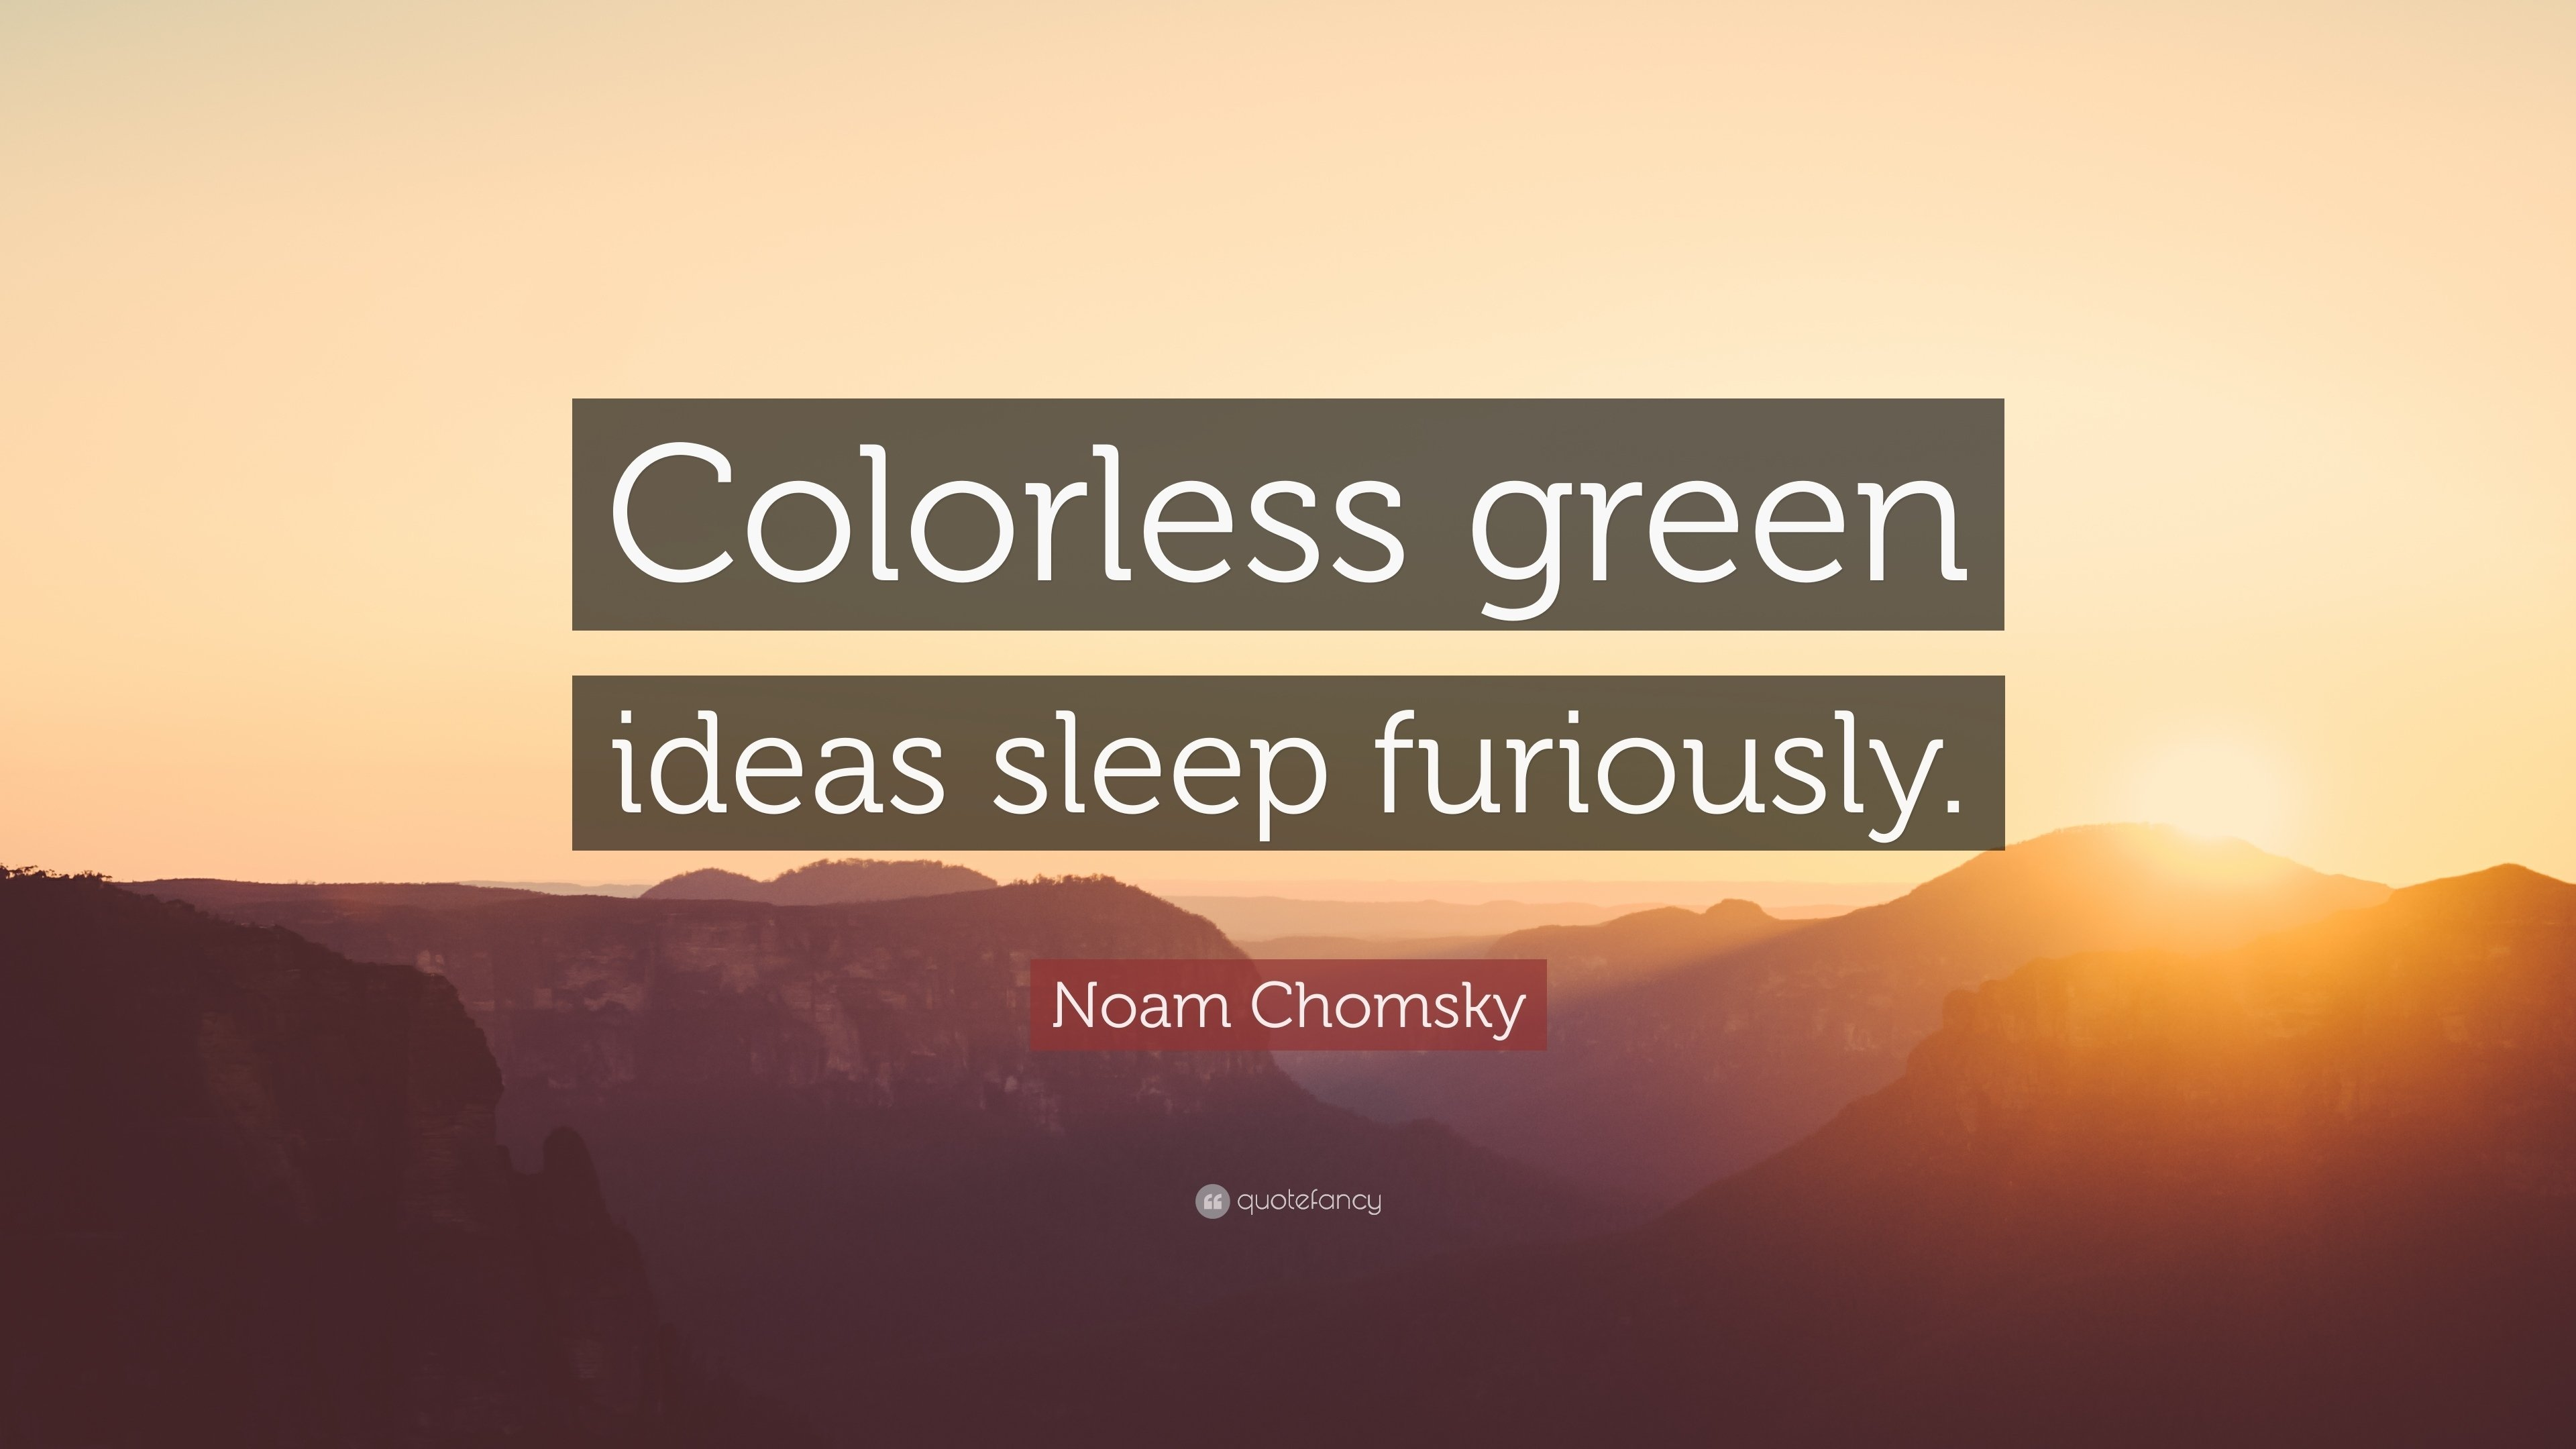 10 Gorgeous Colorless Green Ideas Sleep Furiously noam chomsky quote colorless green ideas sleep furiously 12 1 2021